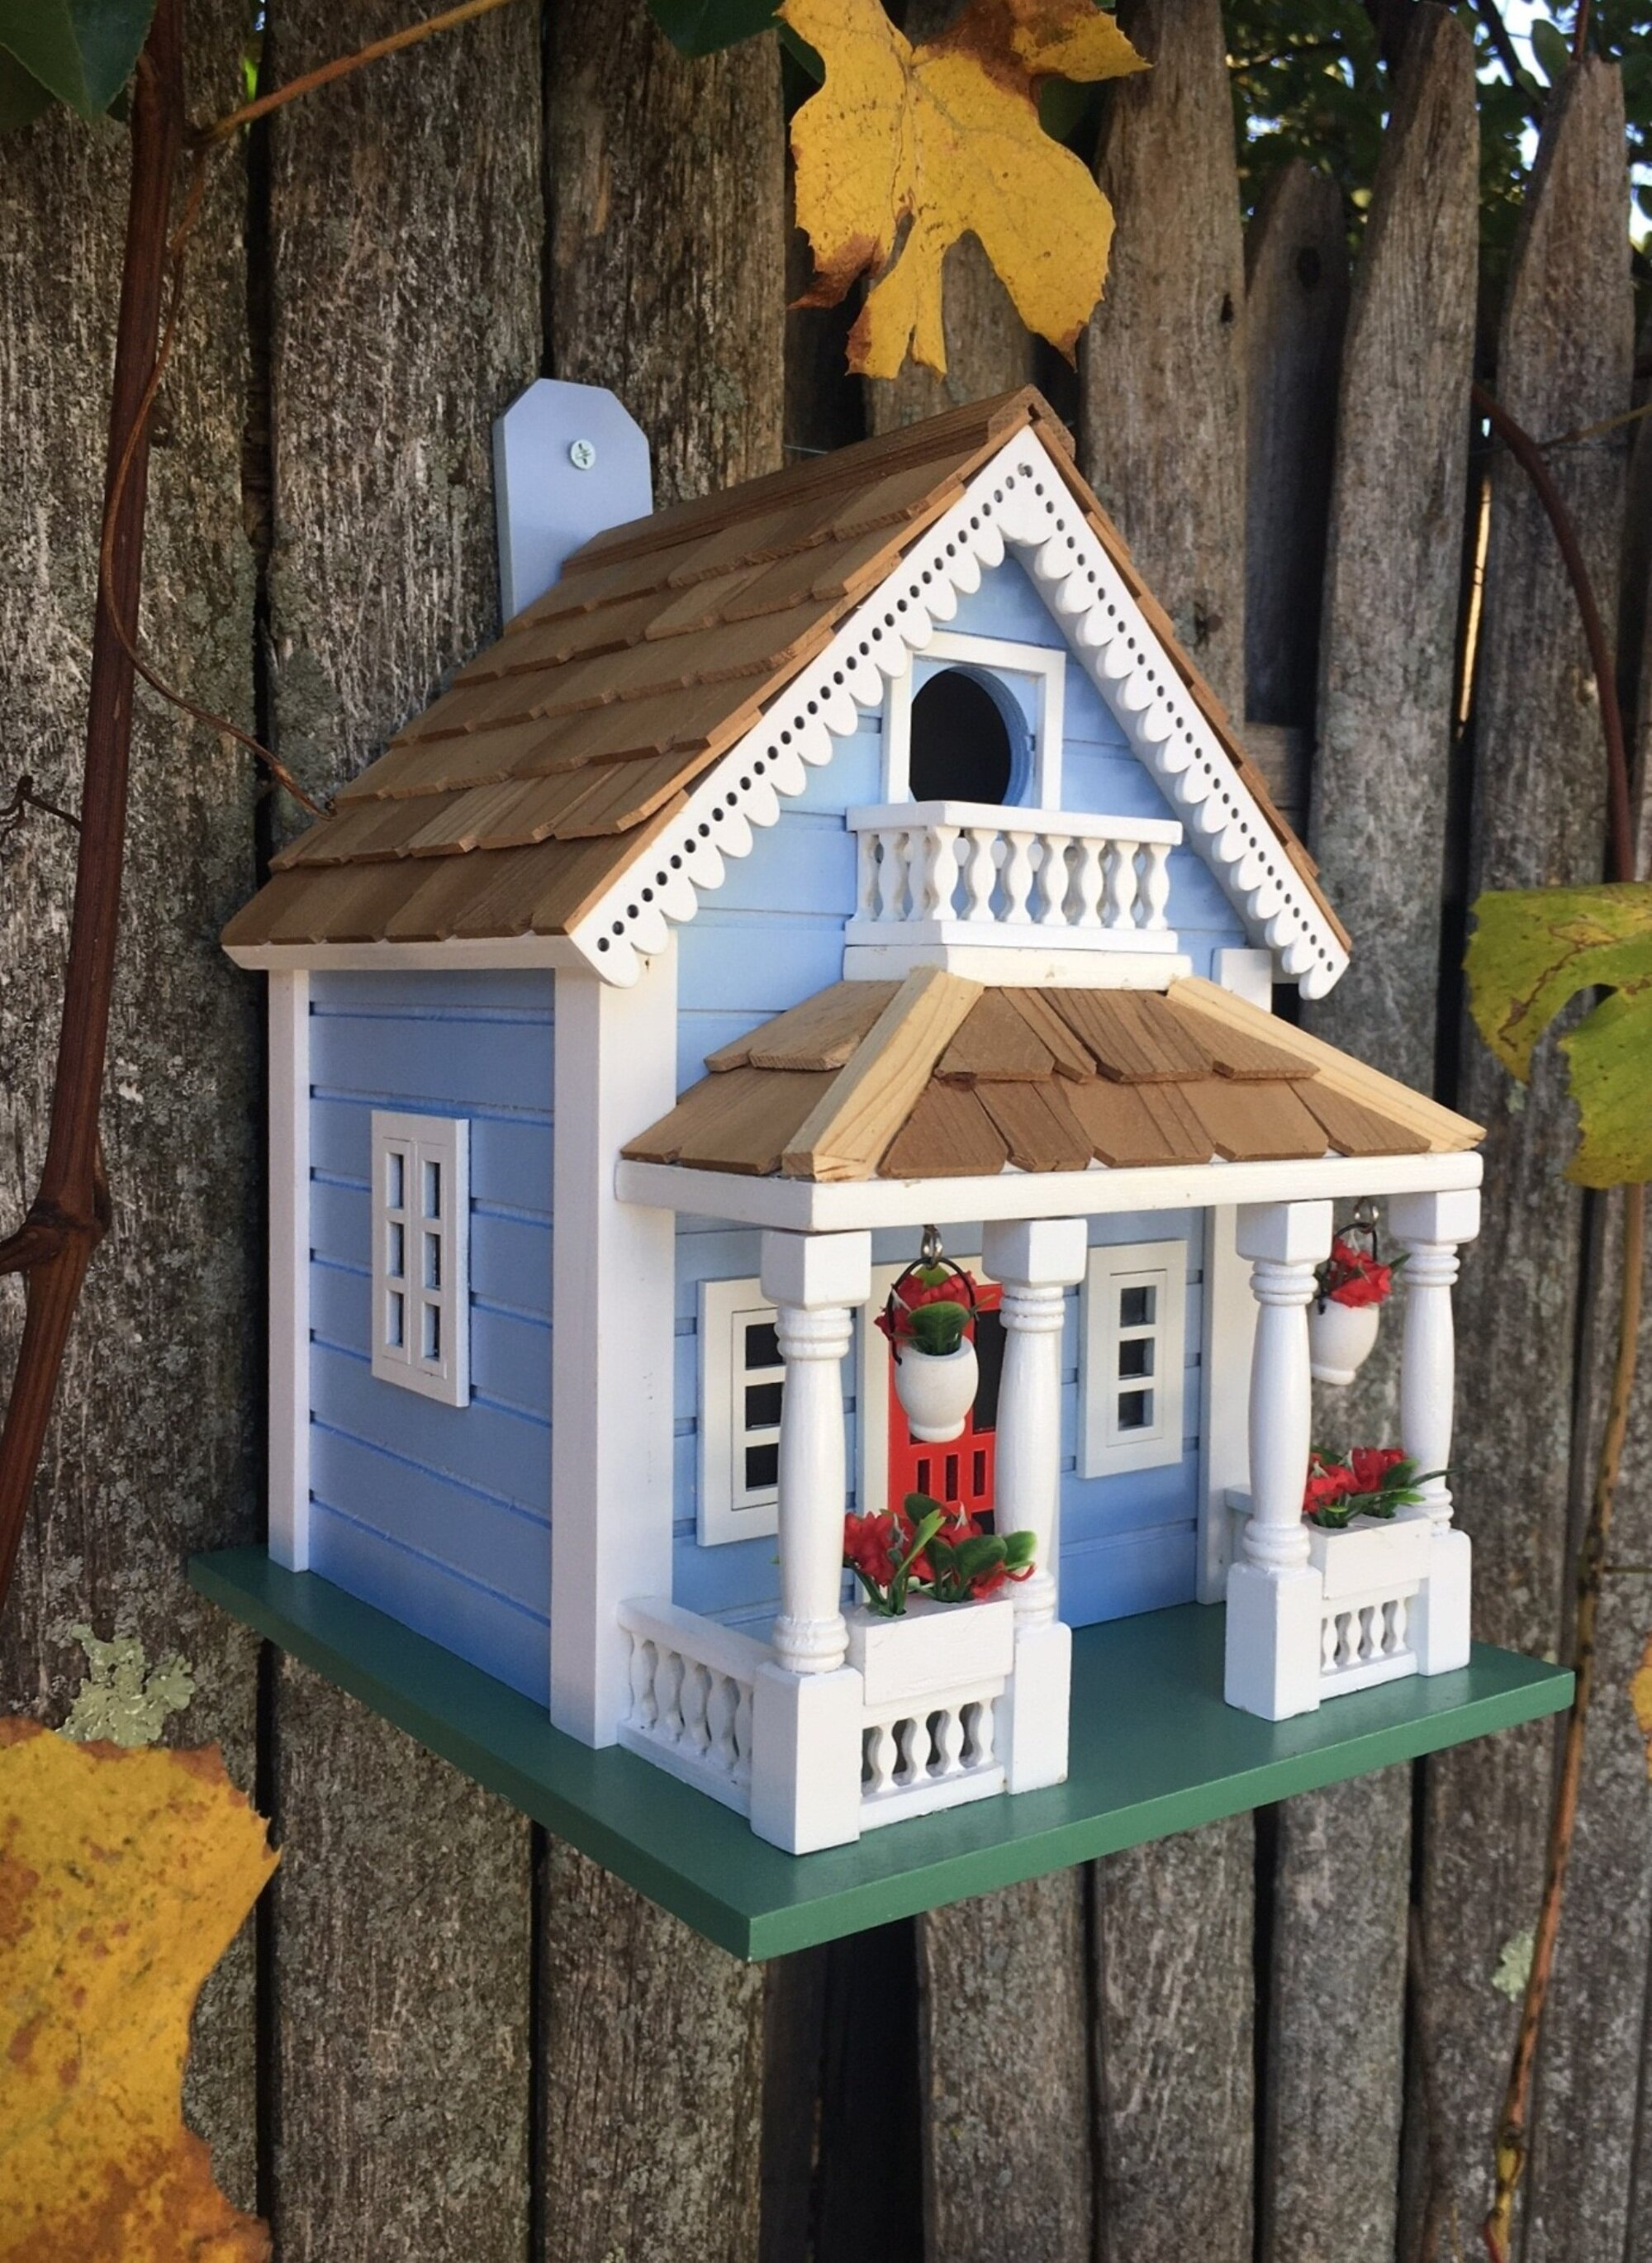 Medium Bird Houses You Ll Love In 2021 Wayfair